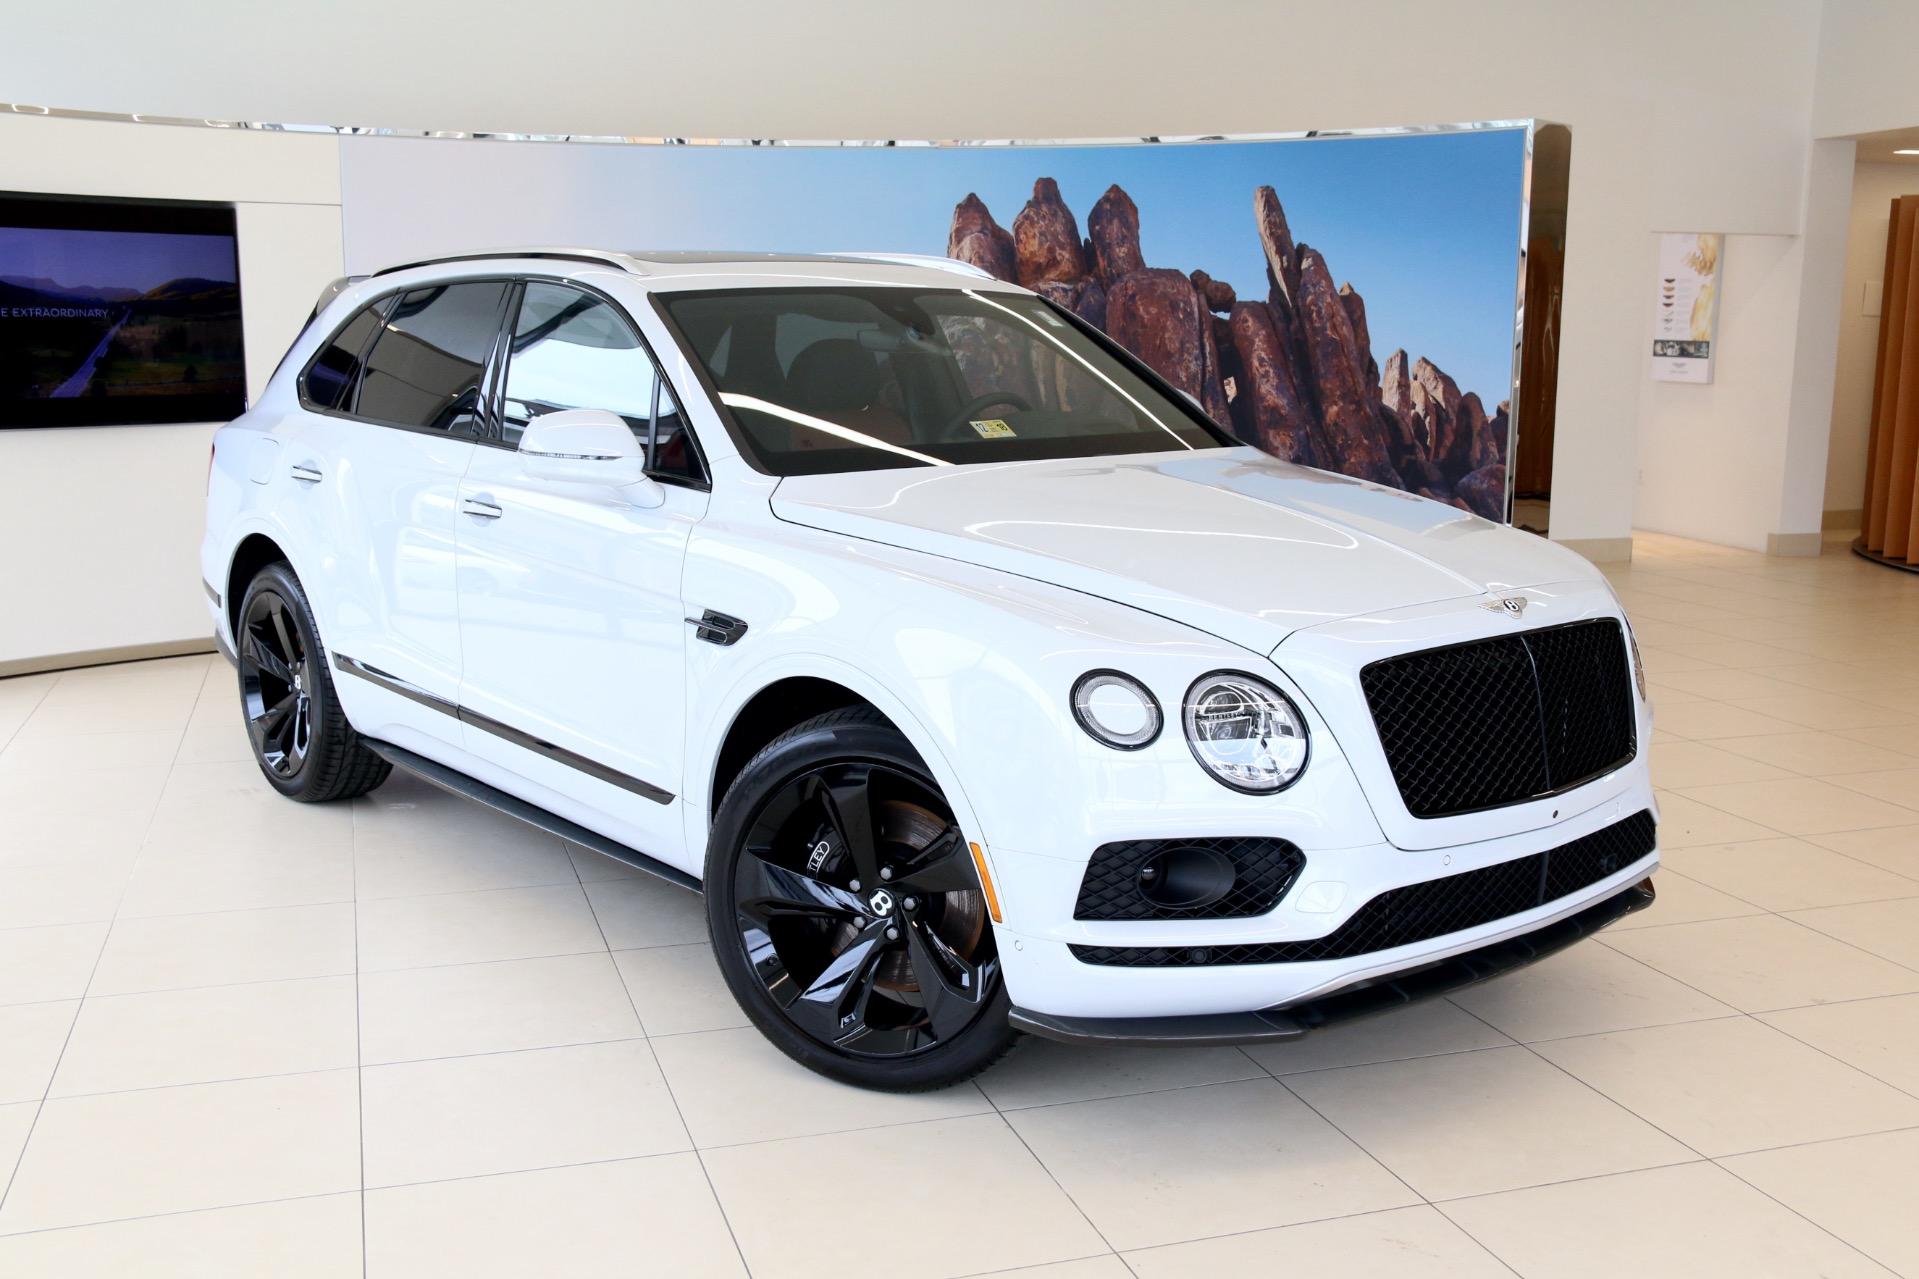 2018 Bentley Bentayga Black Edition Stock # 8N021086 For